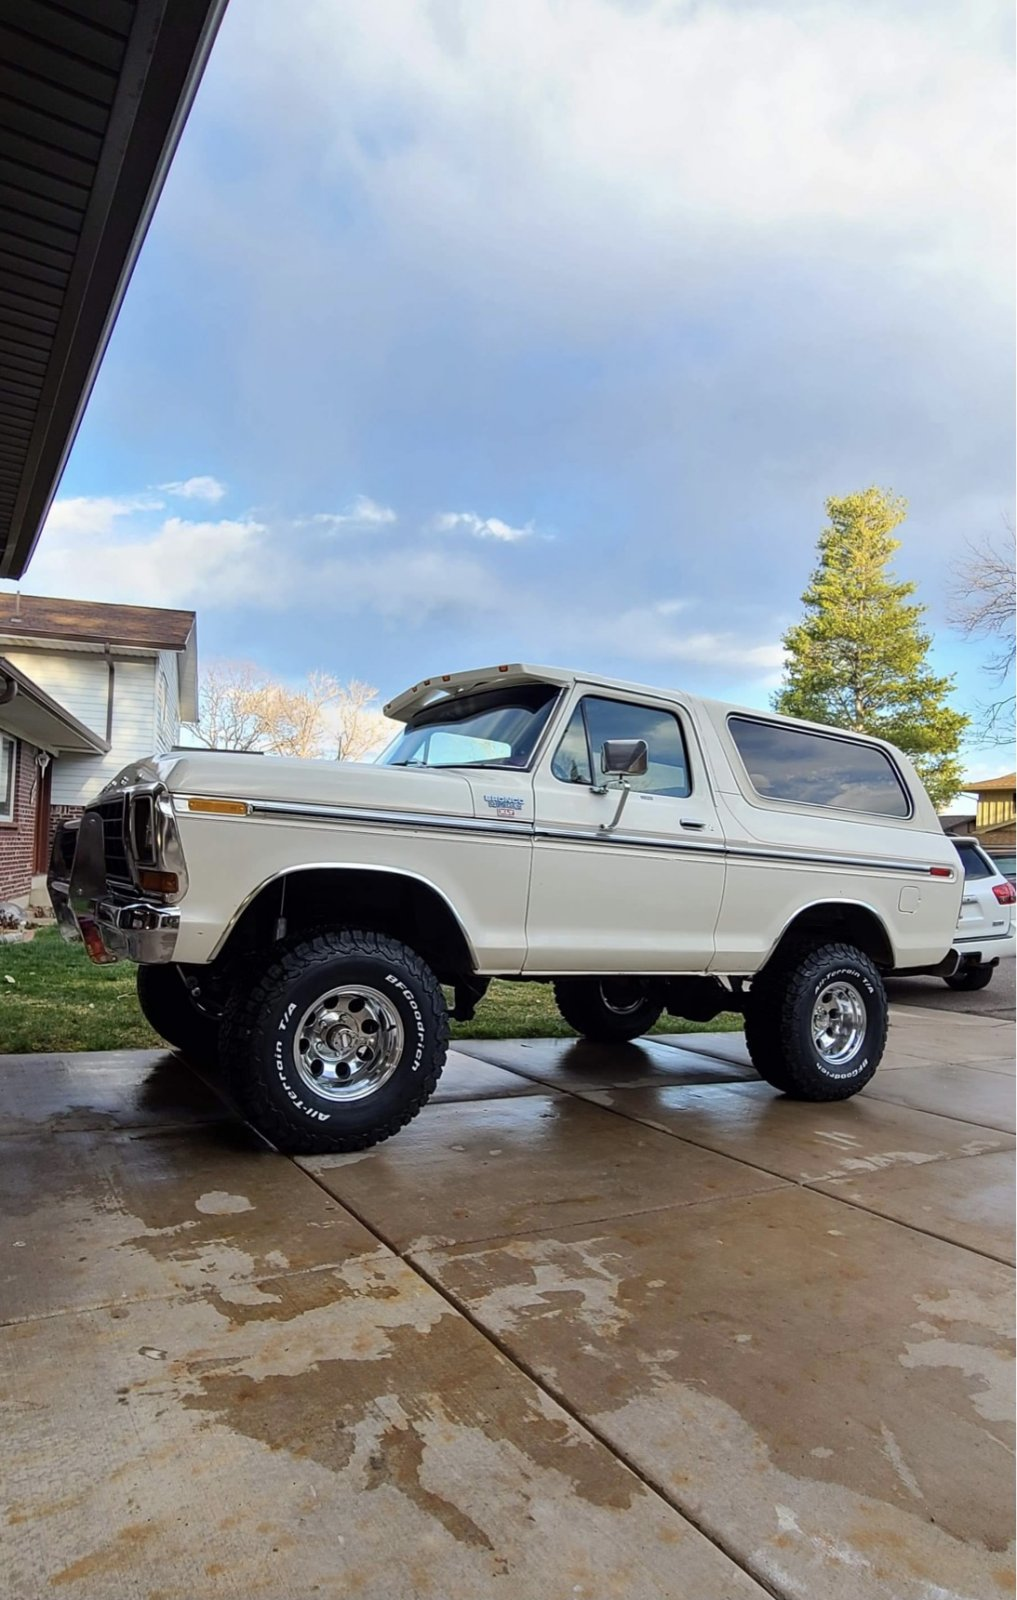 1979 Ford Bronco Ranger XLT Trailer Special - For Sale 3.jpg